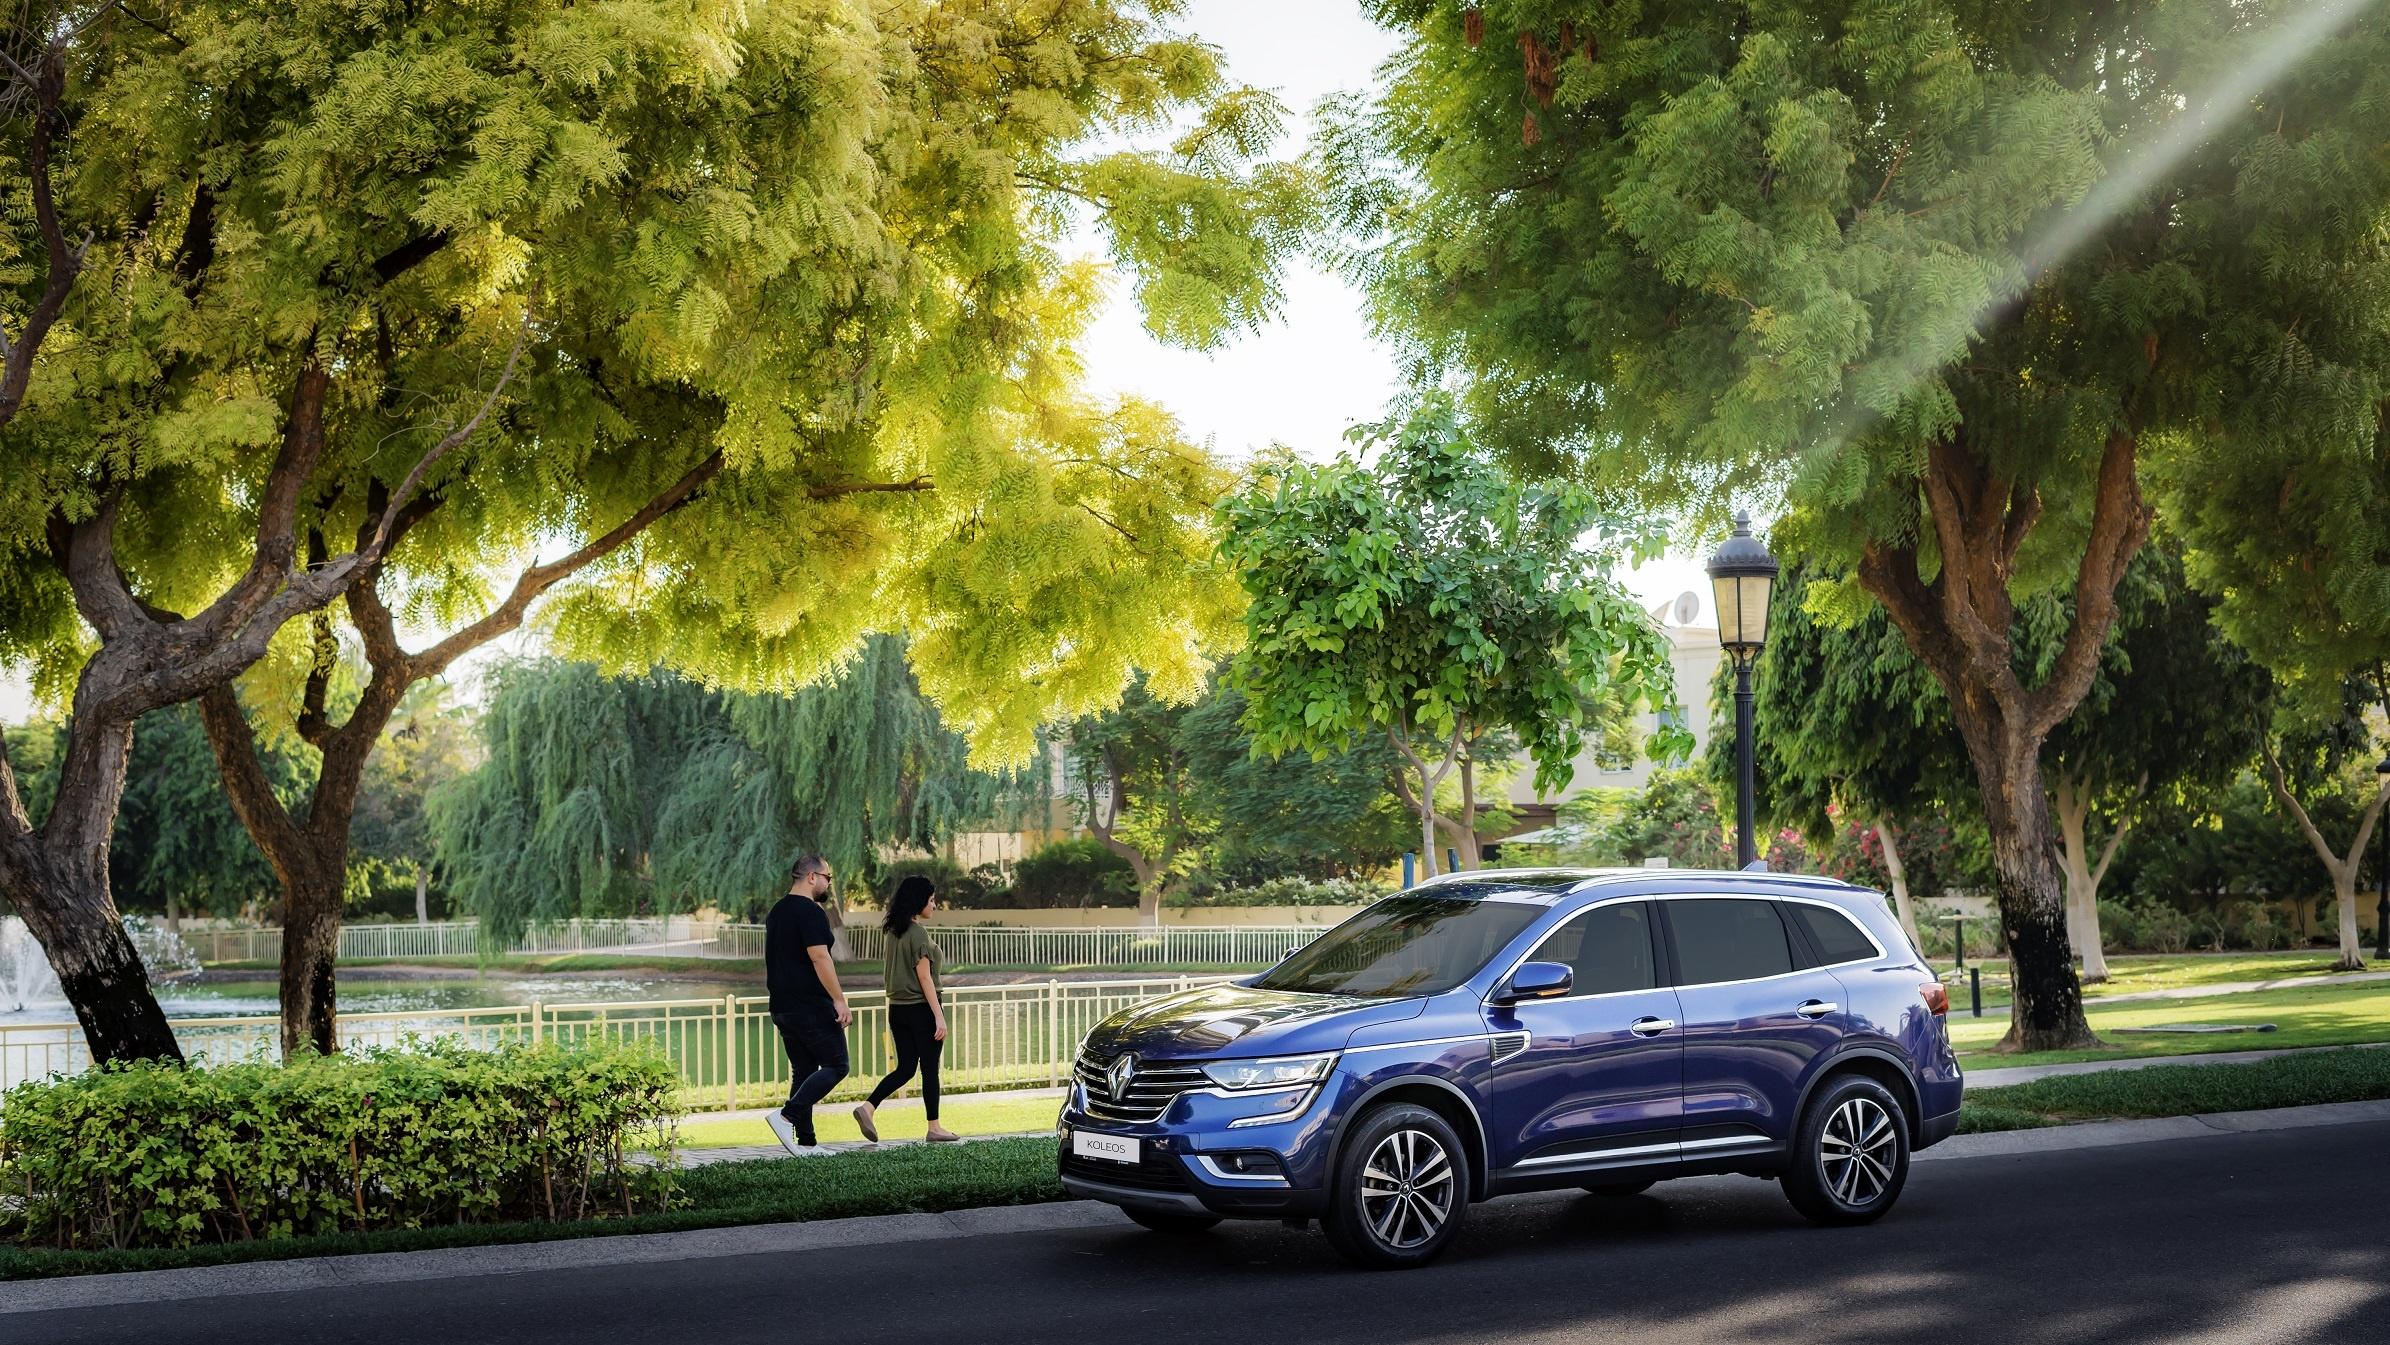 Koleos 2021 makes a stylish arrival at Renault of Arabian Automobiles